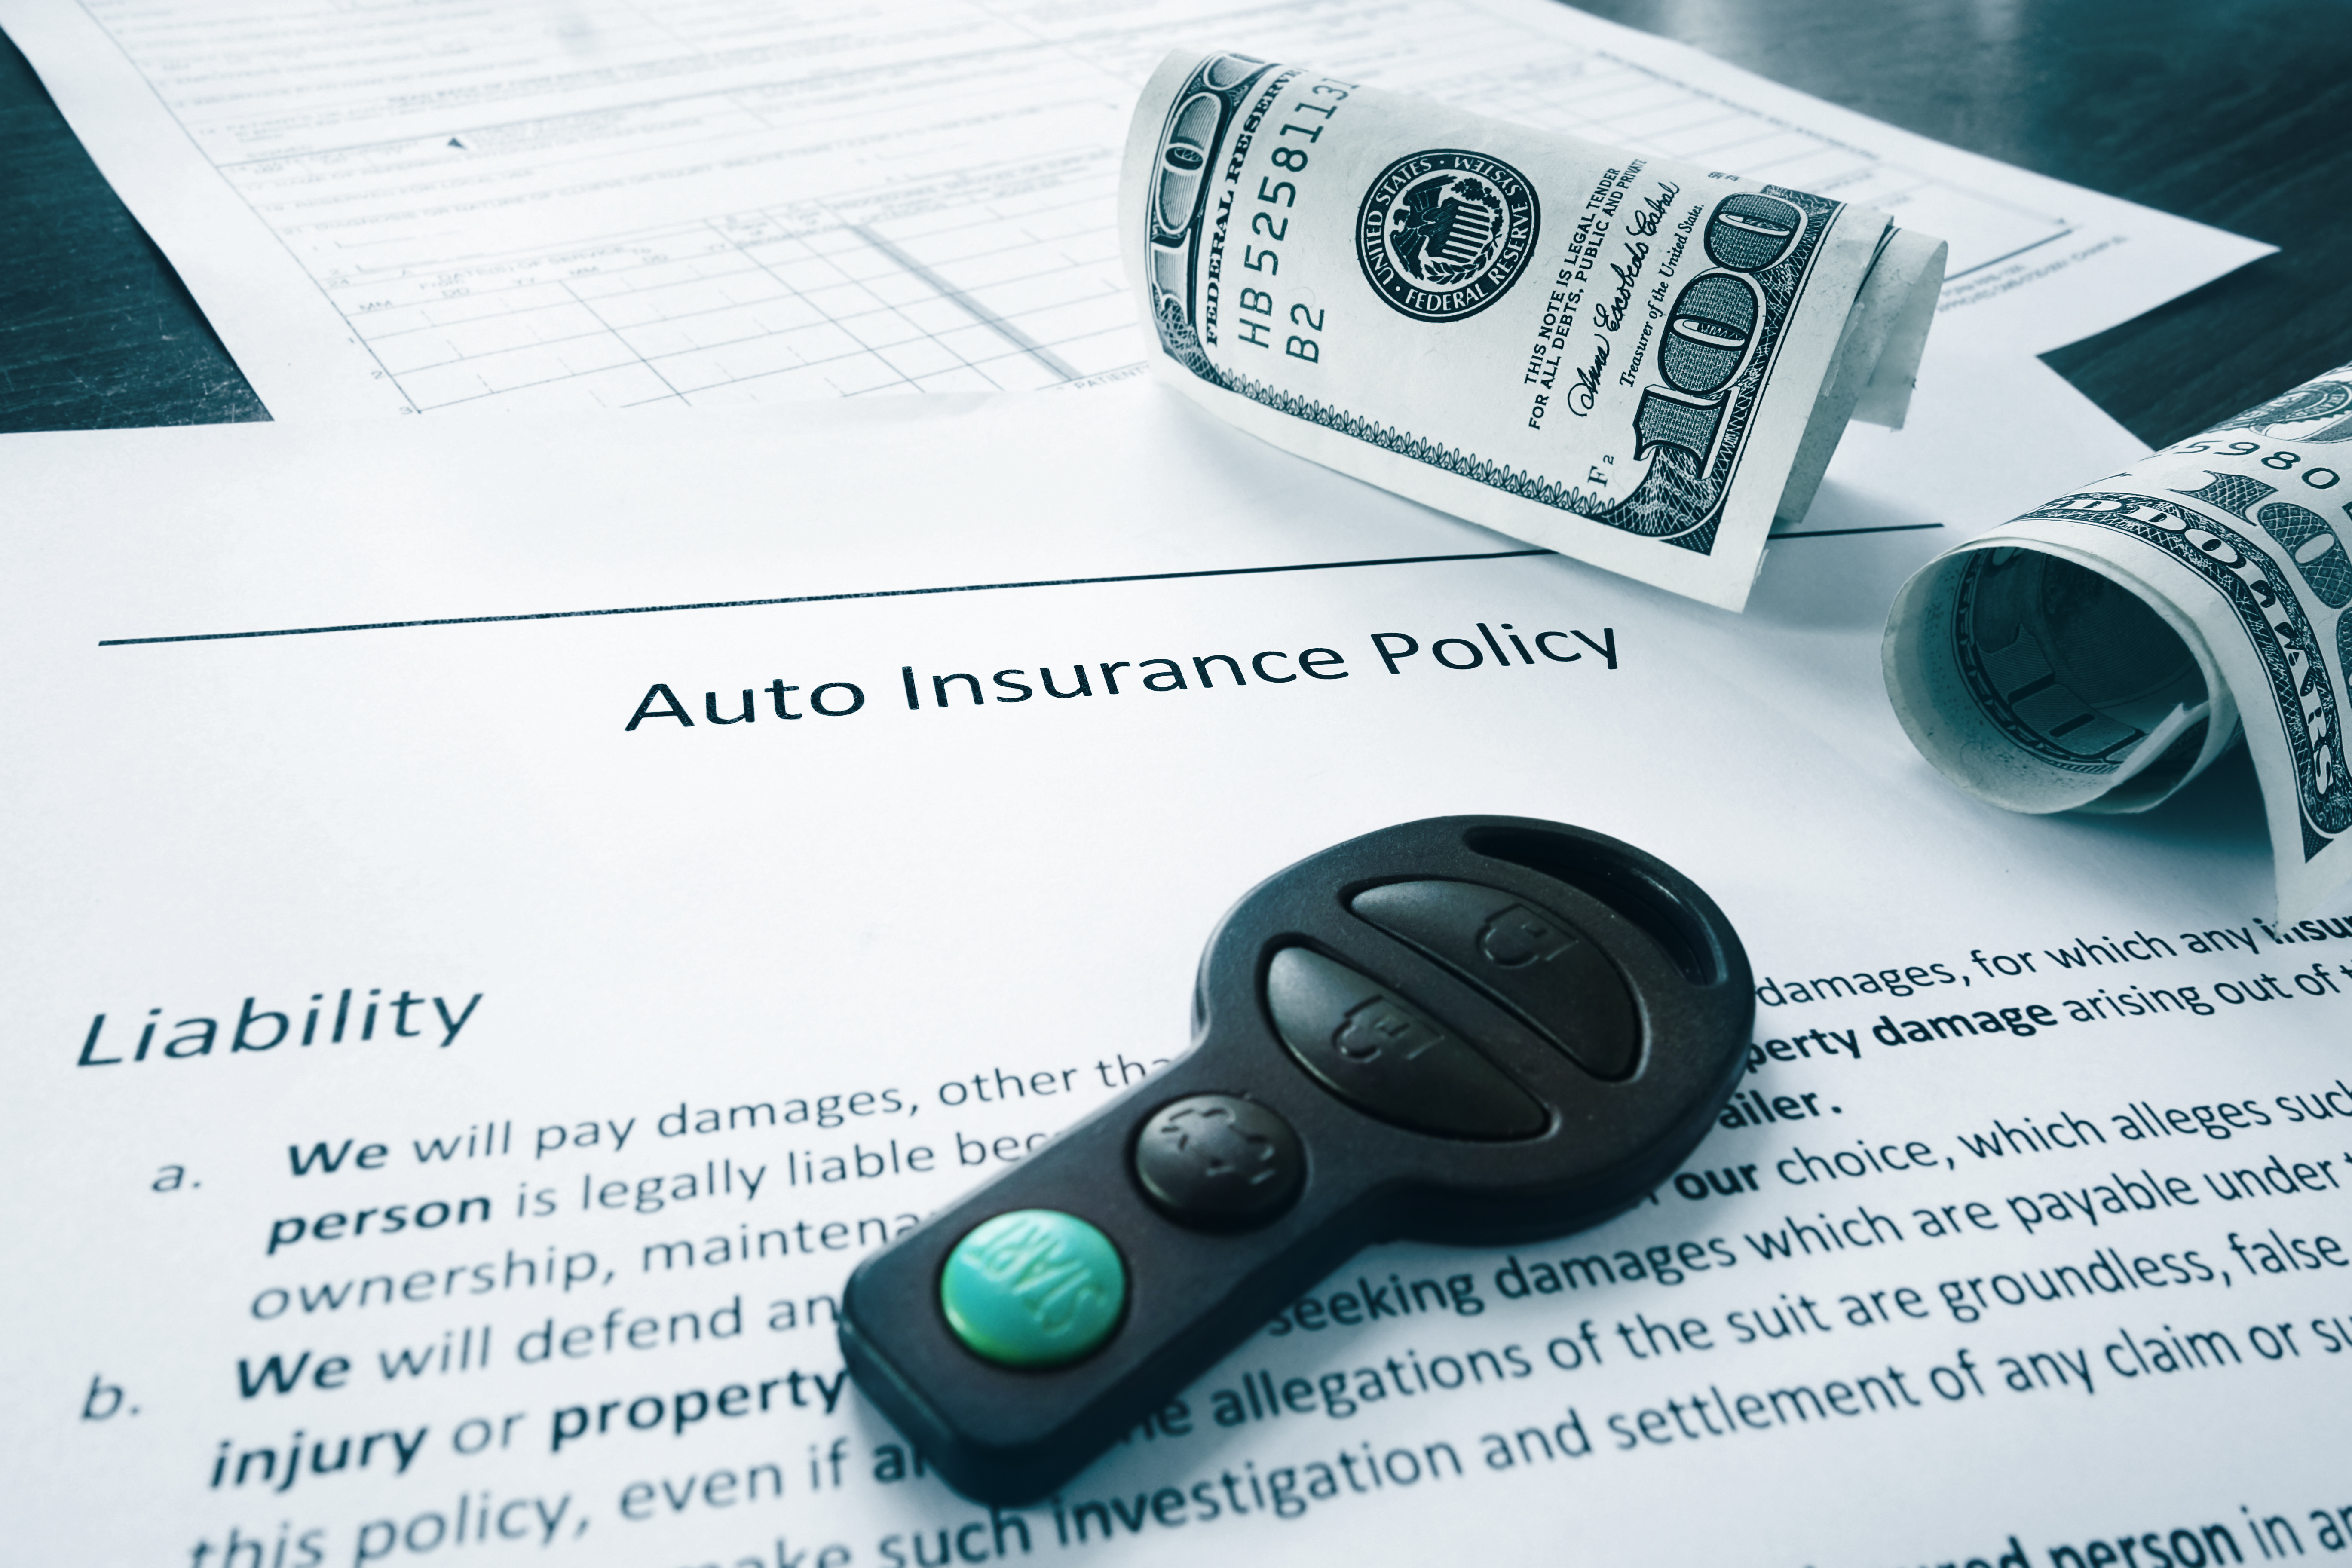 Keller Rohrback L L P  Continues to Investigate Wells Fargo Auto